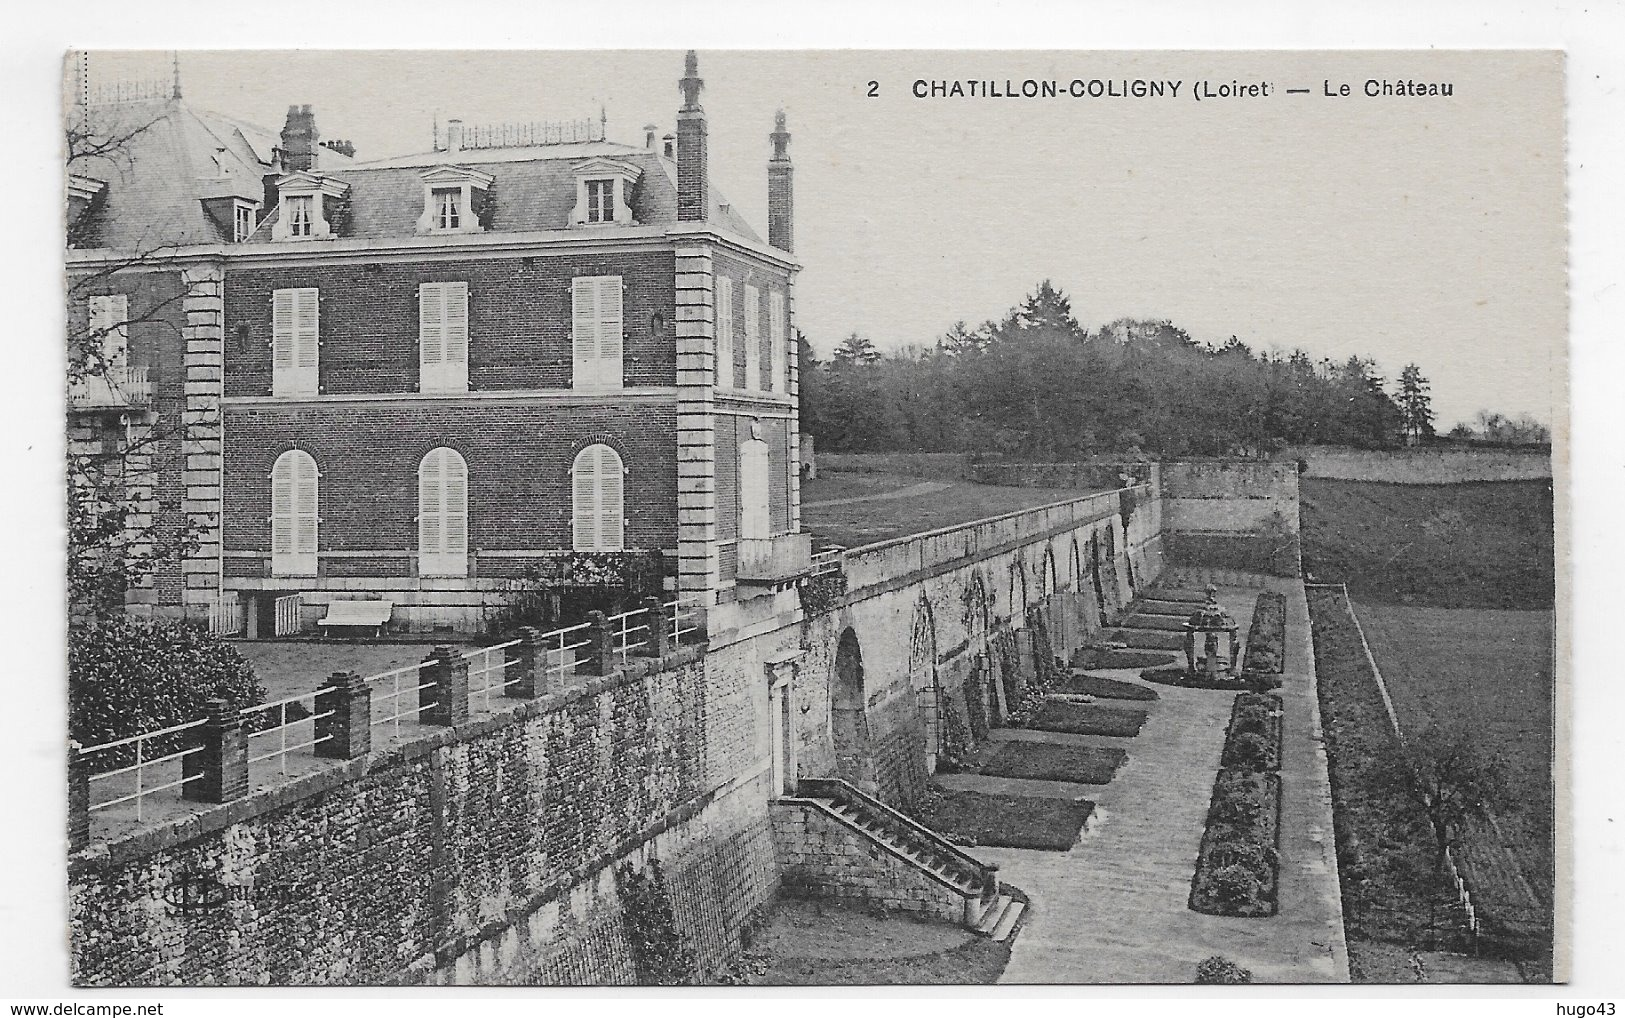 CHATILLON COLIGNY - N° 2 - LE CHATEAU - CPA NON VOYAGEE - Chatillon Coligny